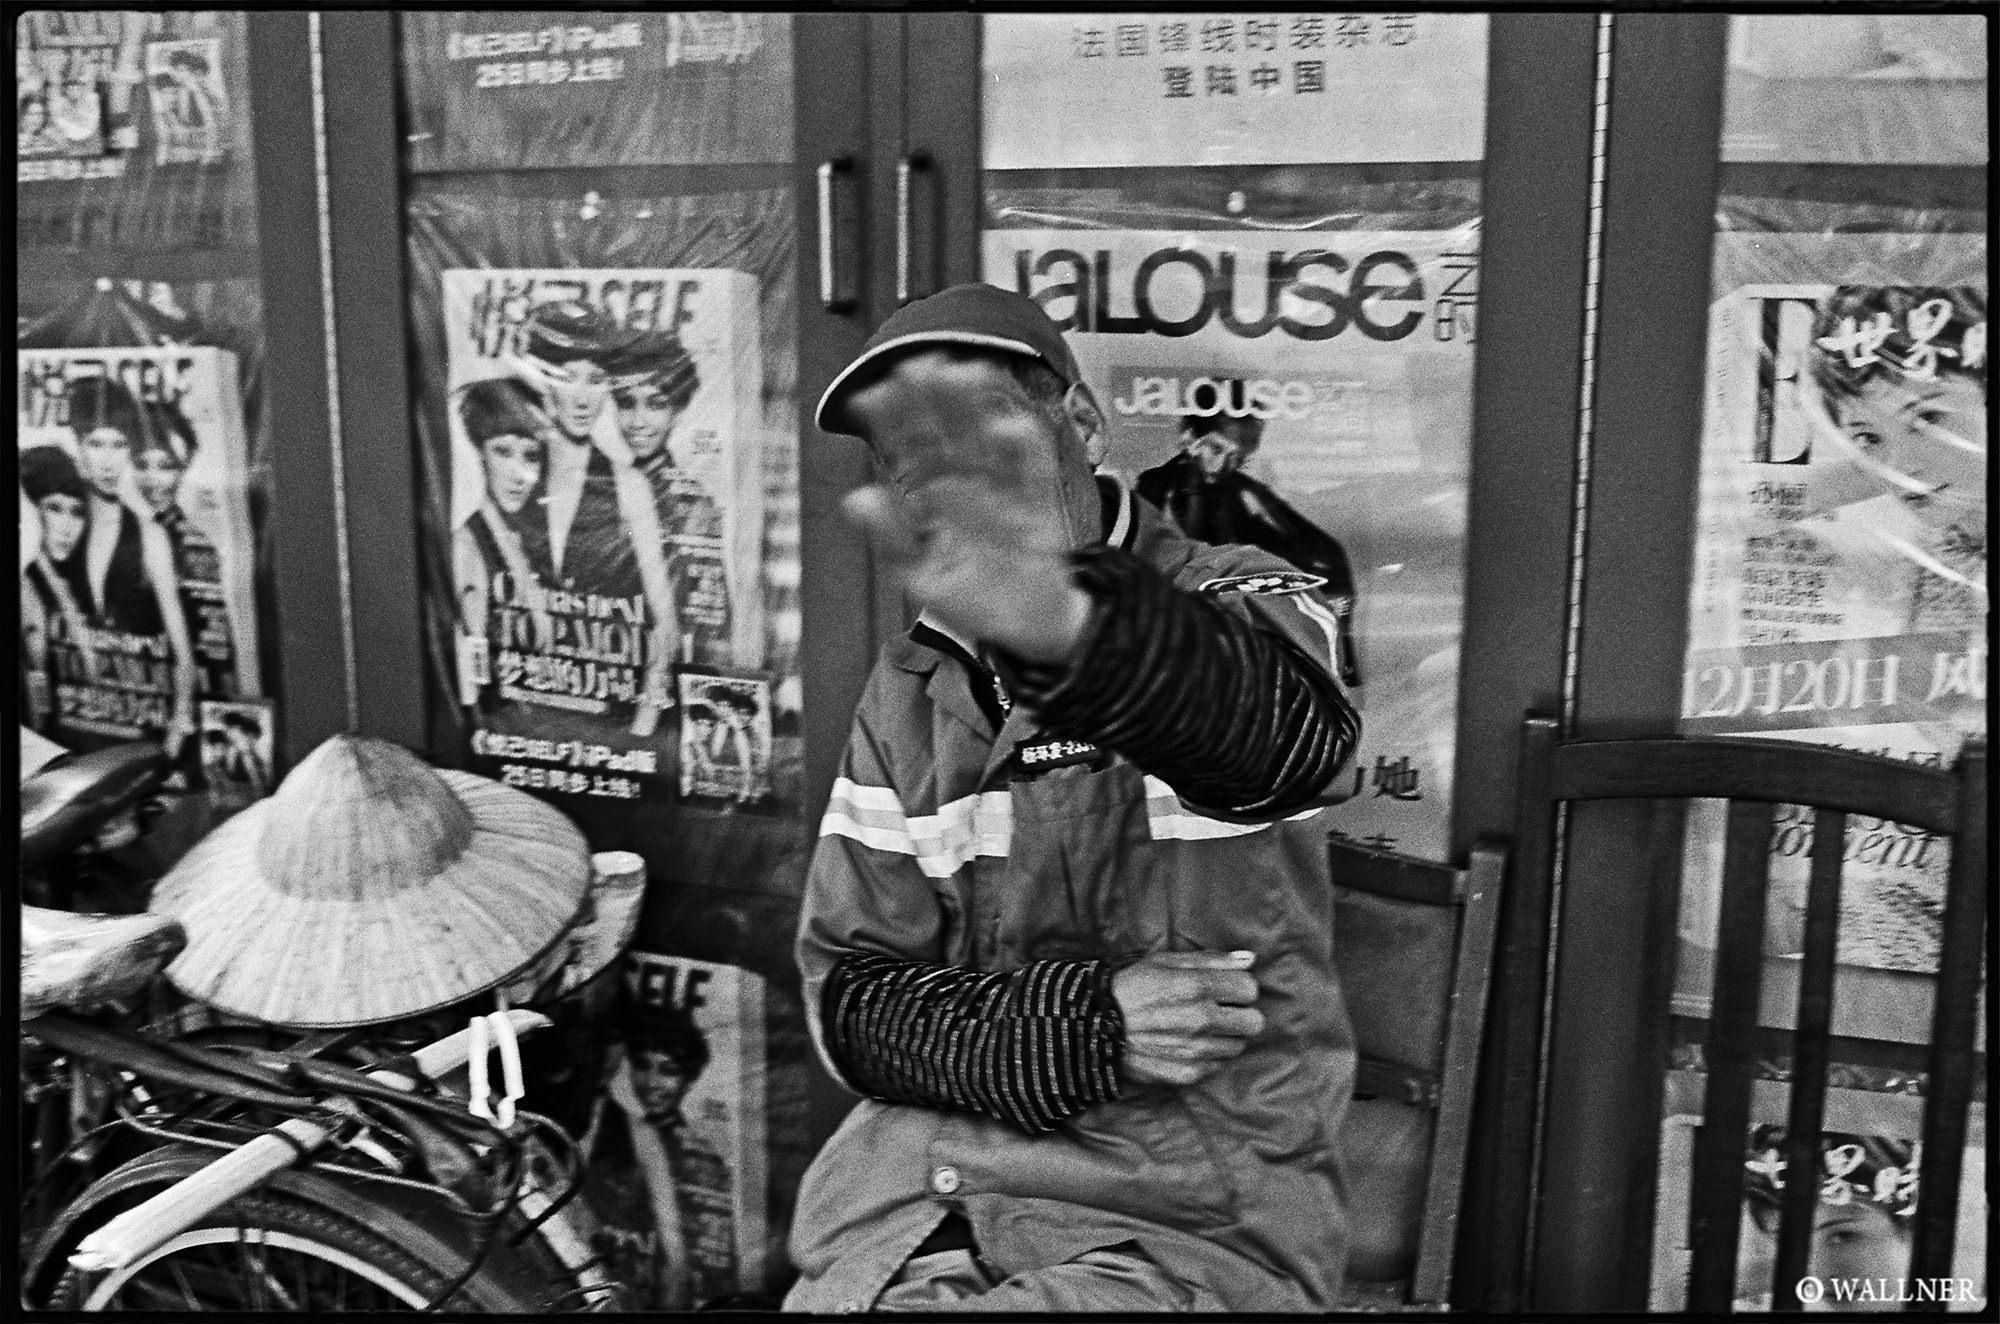 35mmPatrikWallner_Shanghai_NotDown LOWQ 2000P